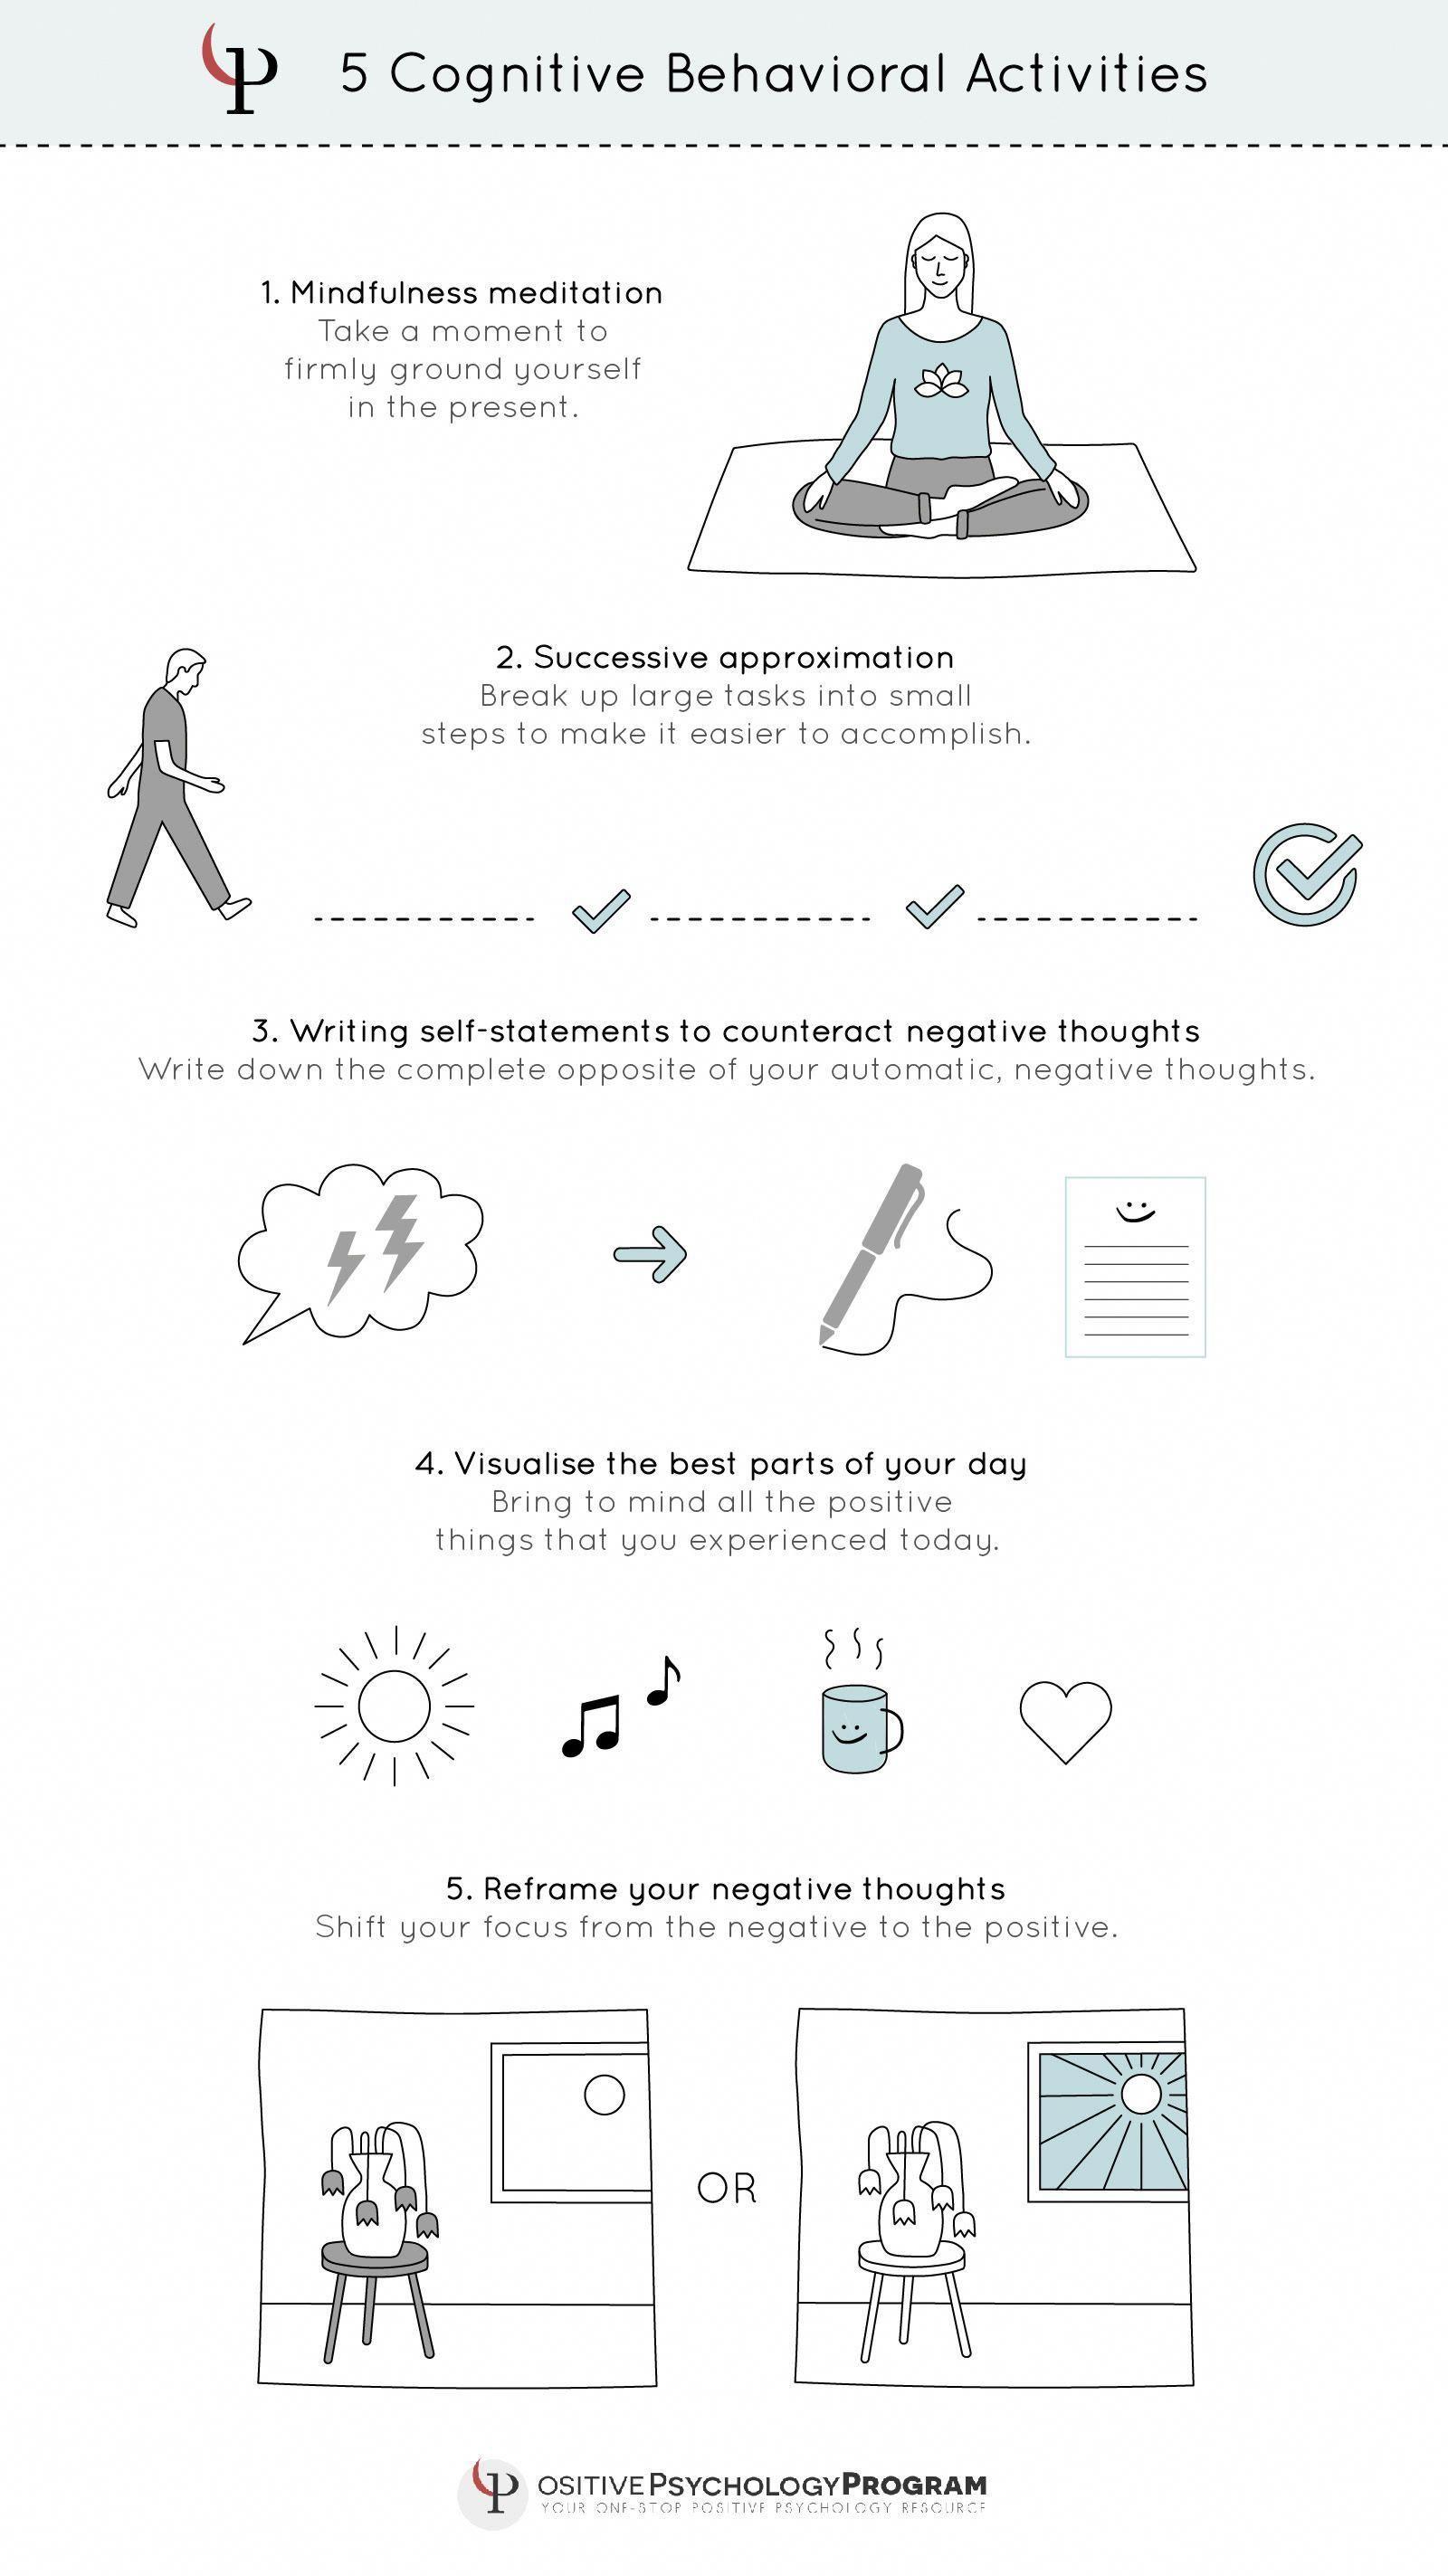 5 Cognitive Behavioral Activities Psychologicalimages